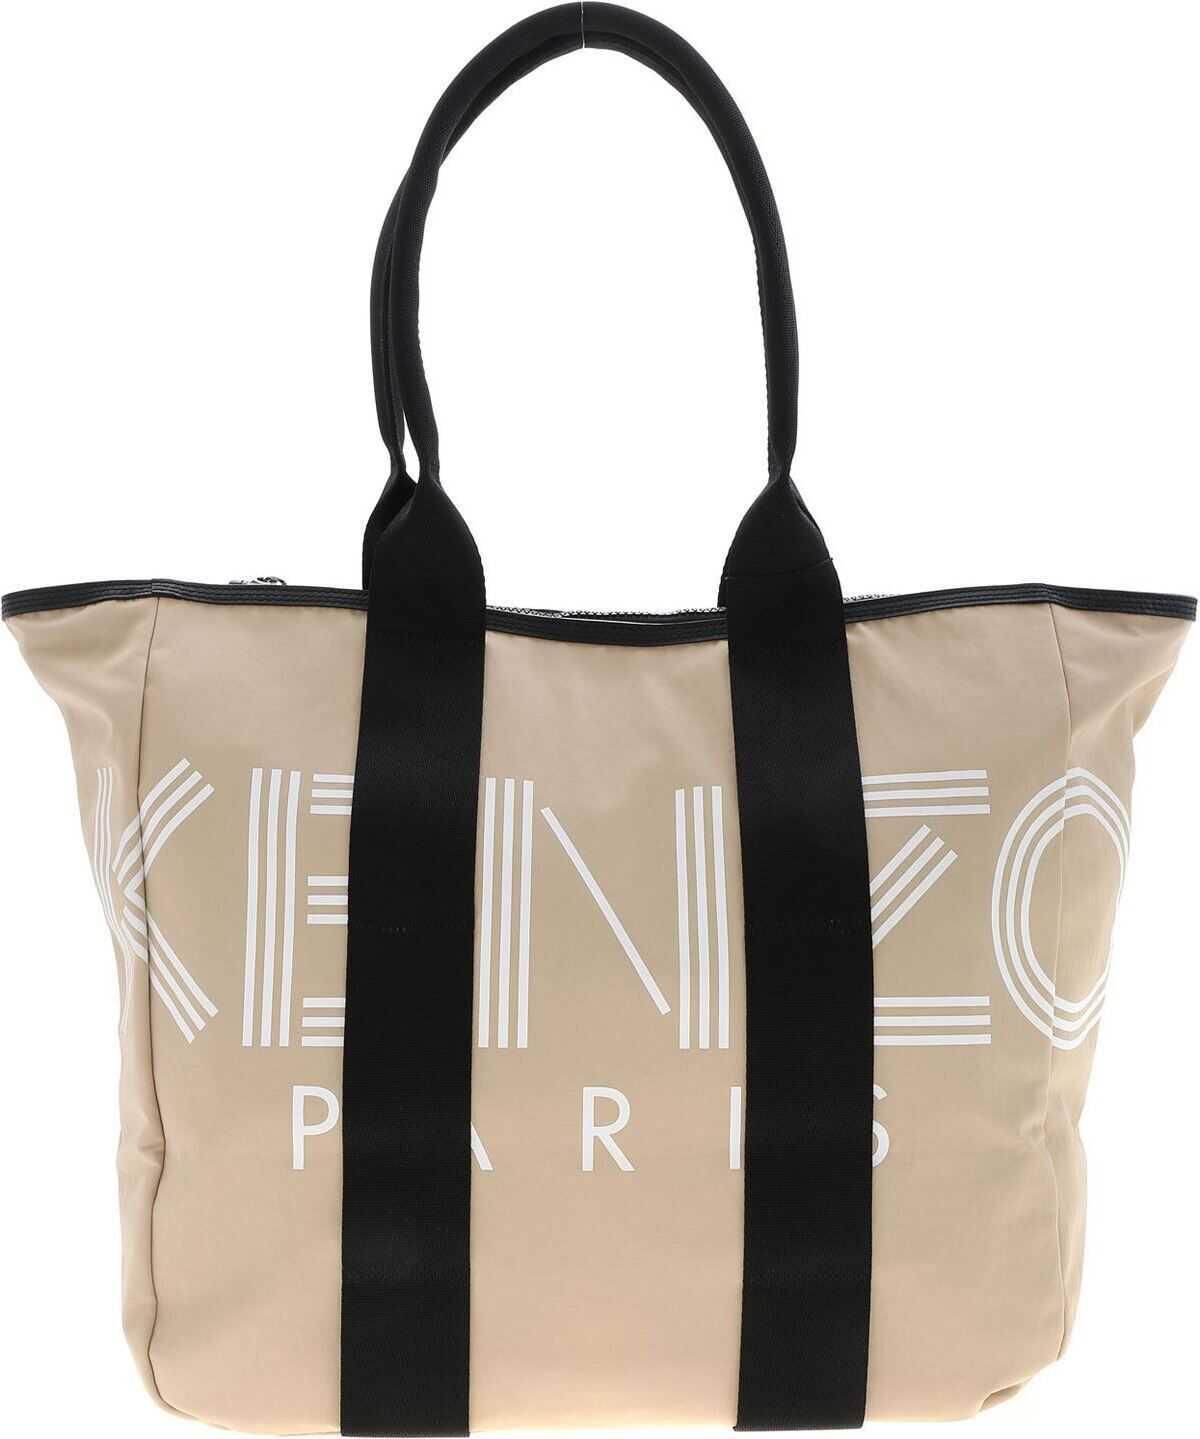 Kenzo Paris Tote Bag In Beige thumbnail